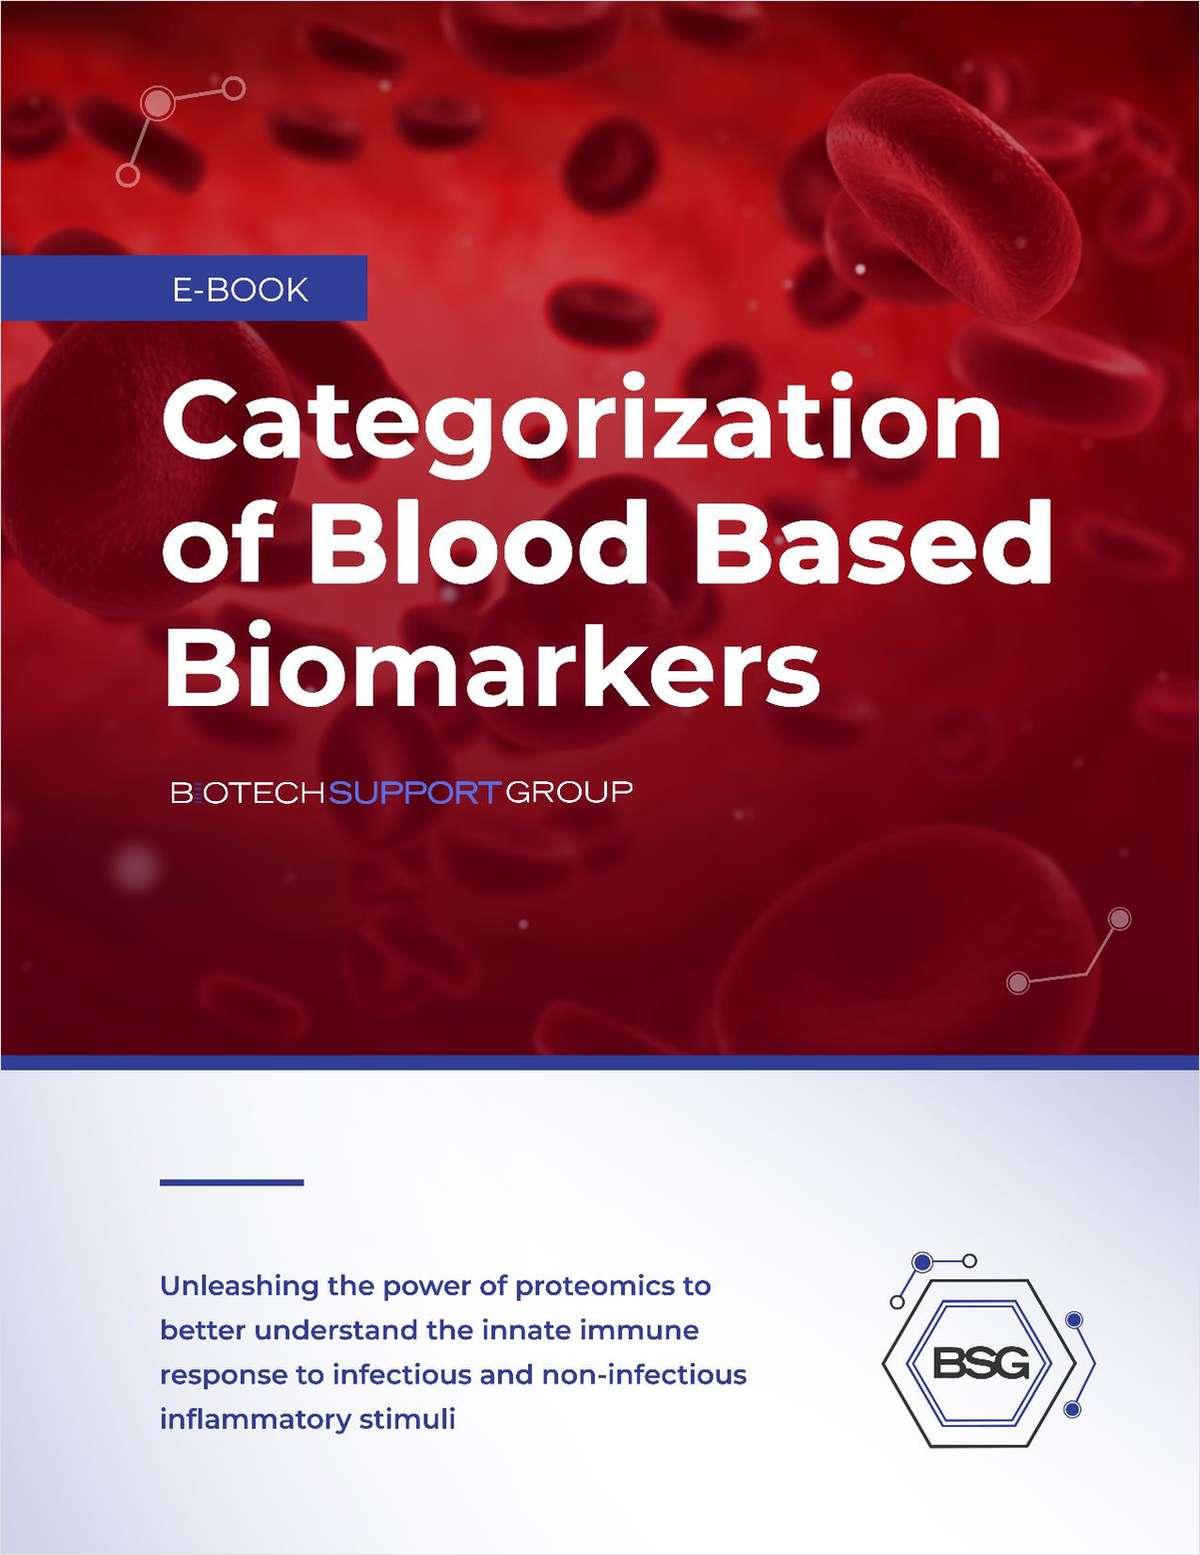 Categorization of Blood-Based Biomarkers